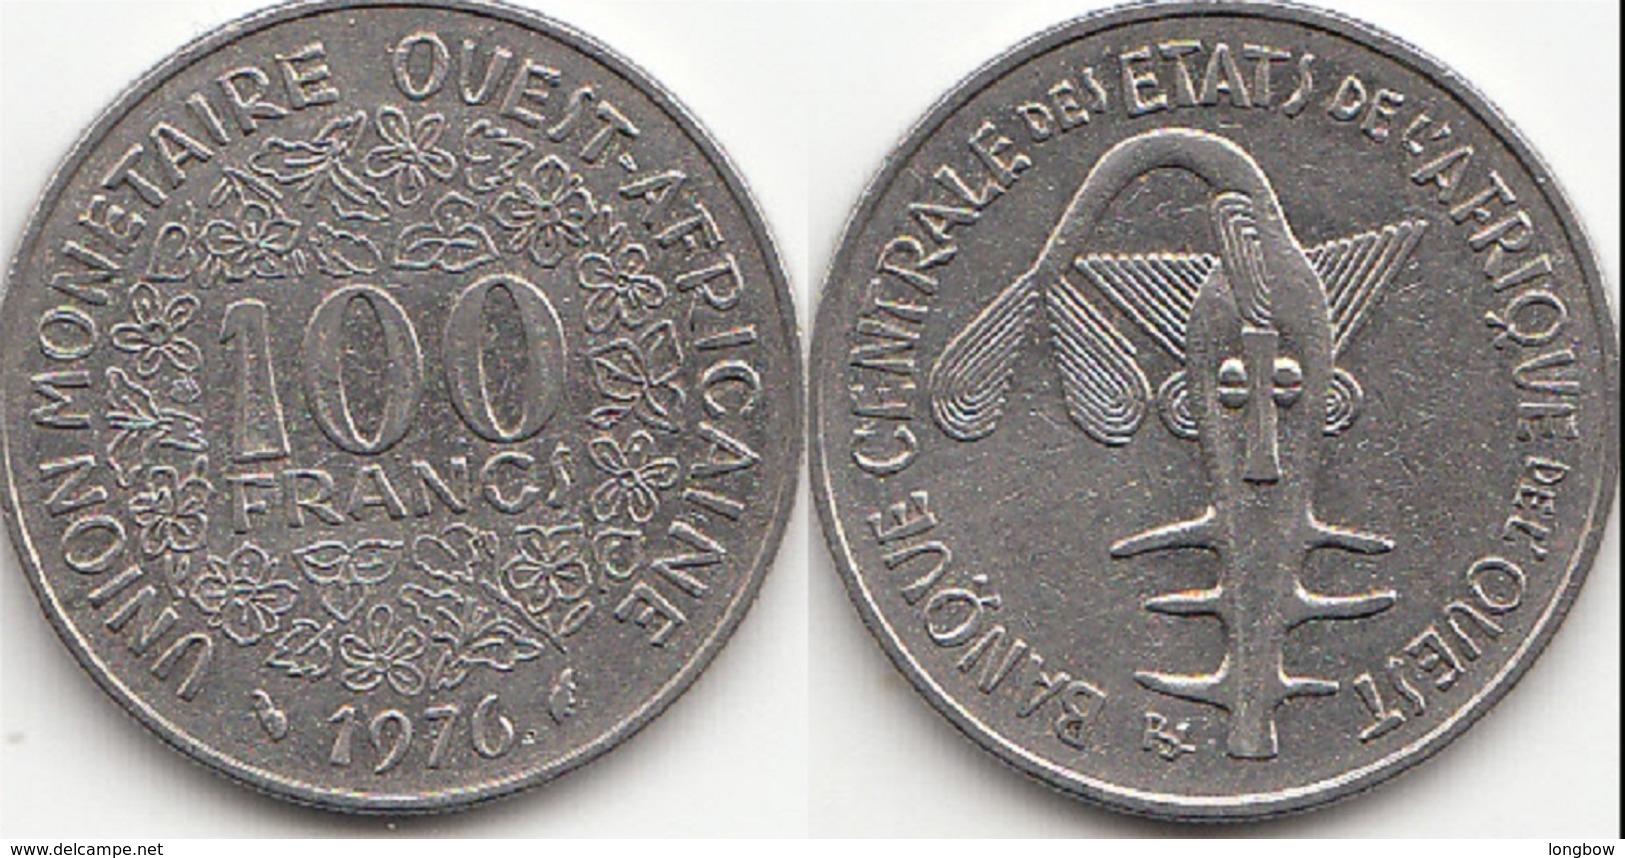 Repubblica Centro Africana 100 CAF Francs 1976 KM#4 - Used - Afrique Orientale & Protectorat D'Ouganda